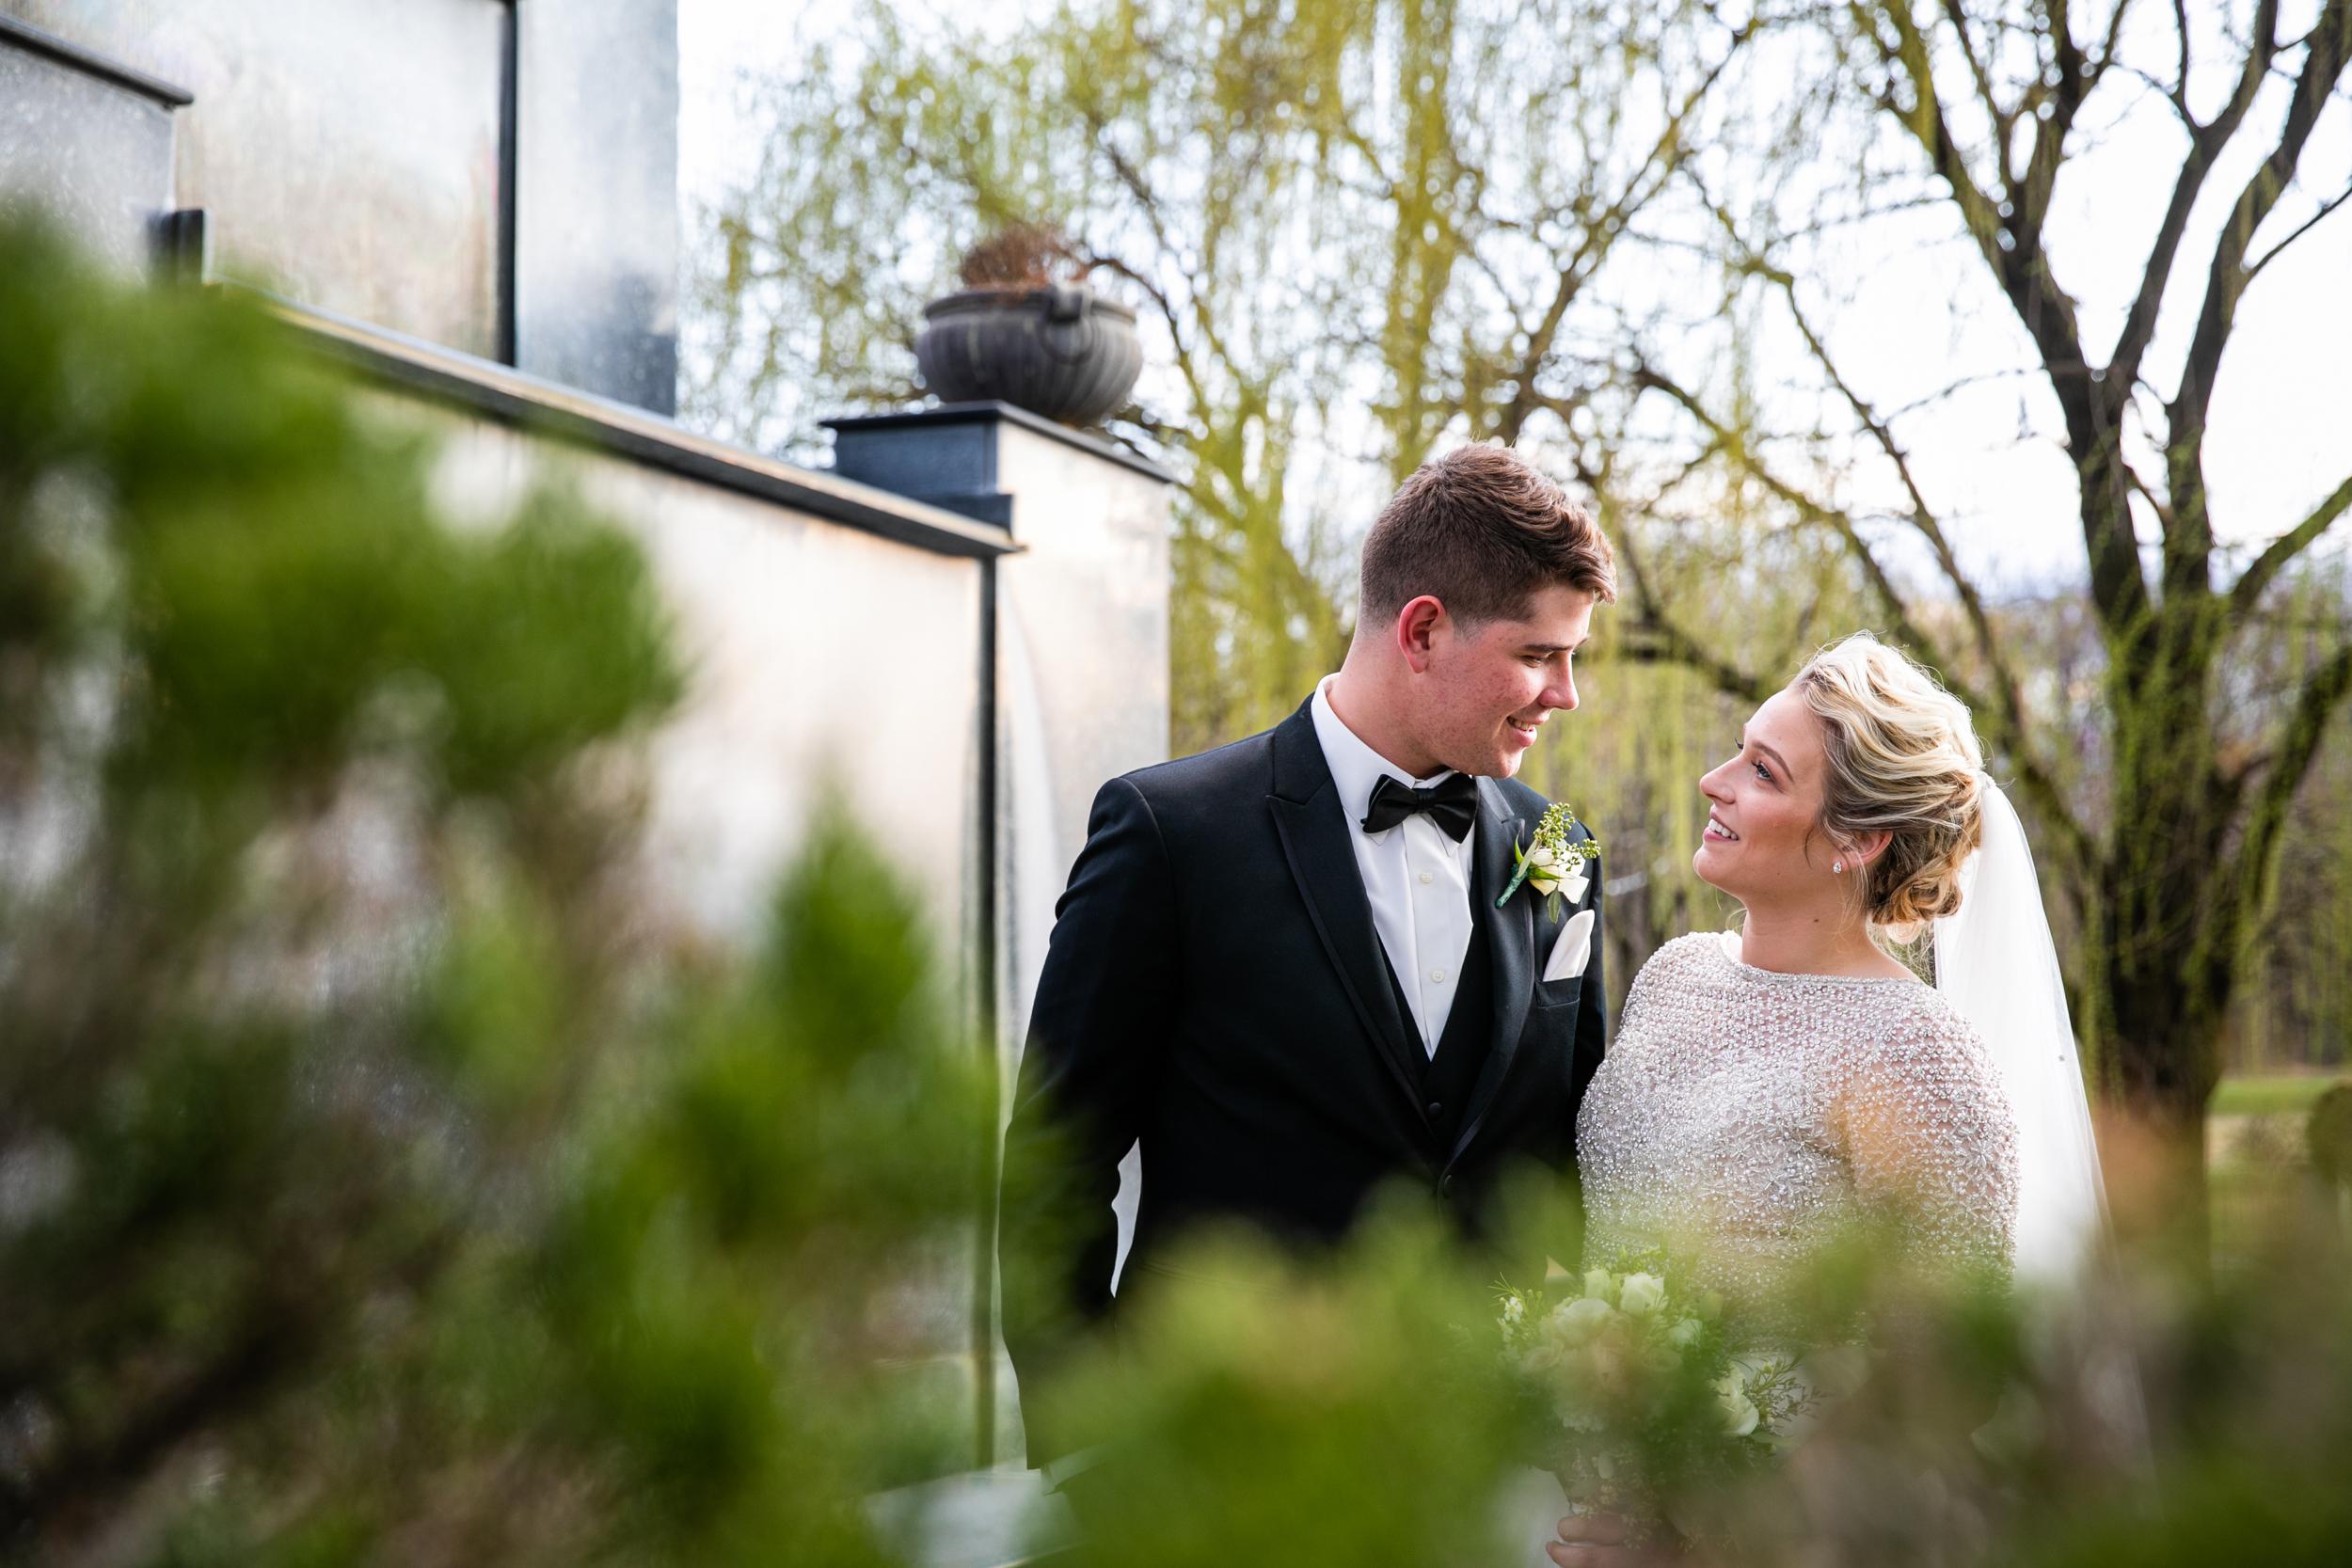 CELEBRATIONS BENSALEM WEDDING PHOTOGRAPHY-65.jpg